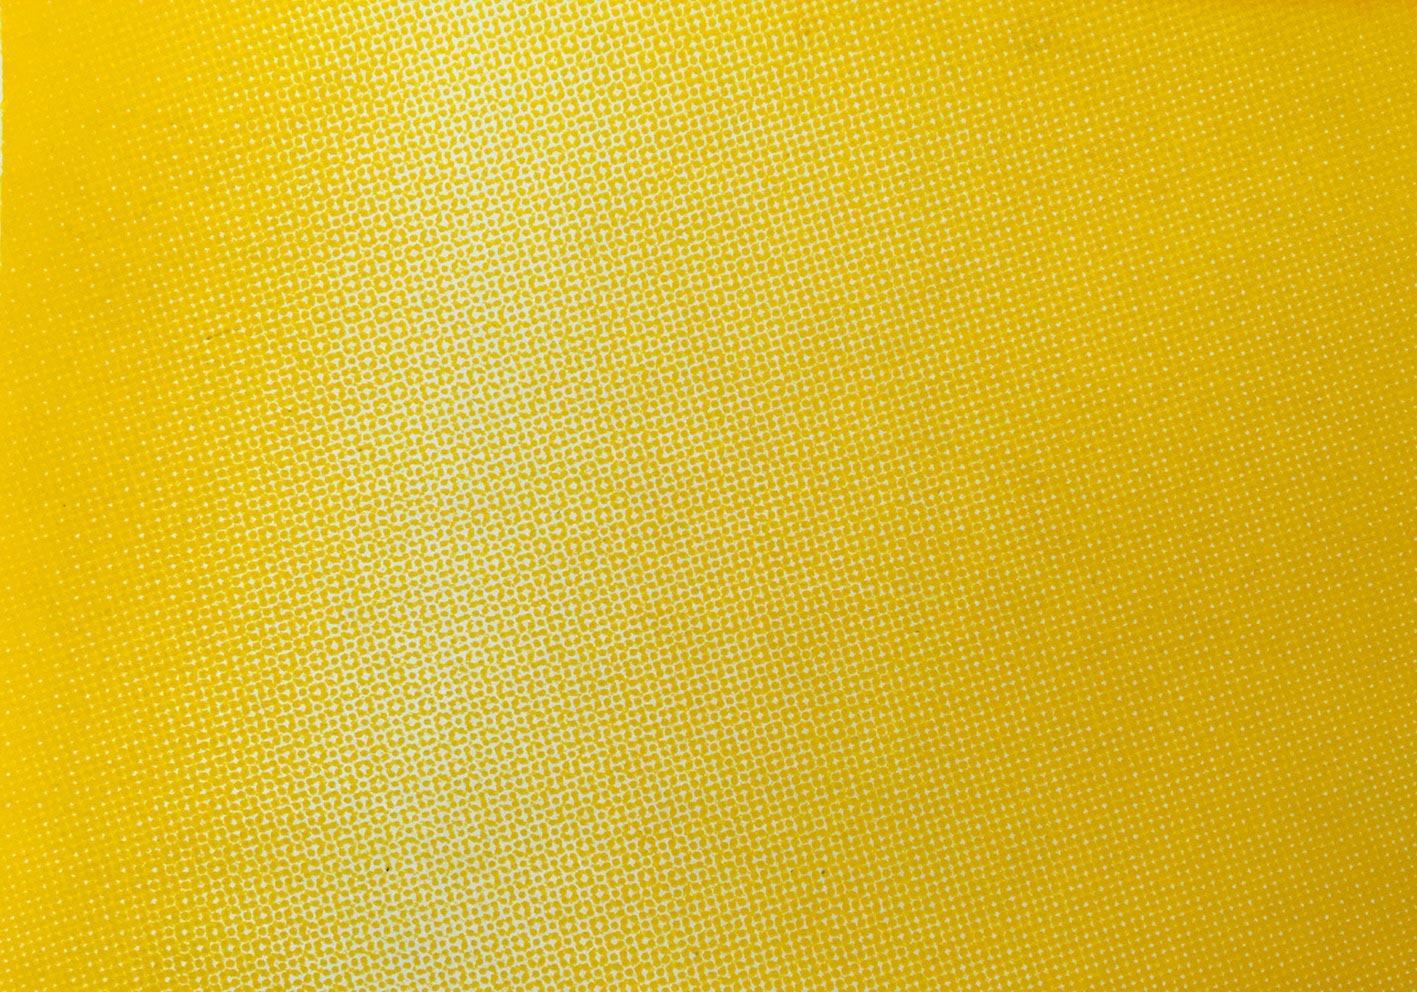 half_tone_gradient 0171w.jpg